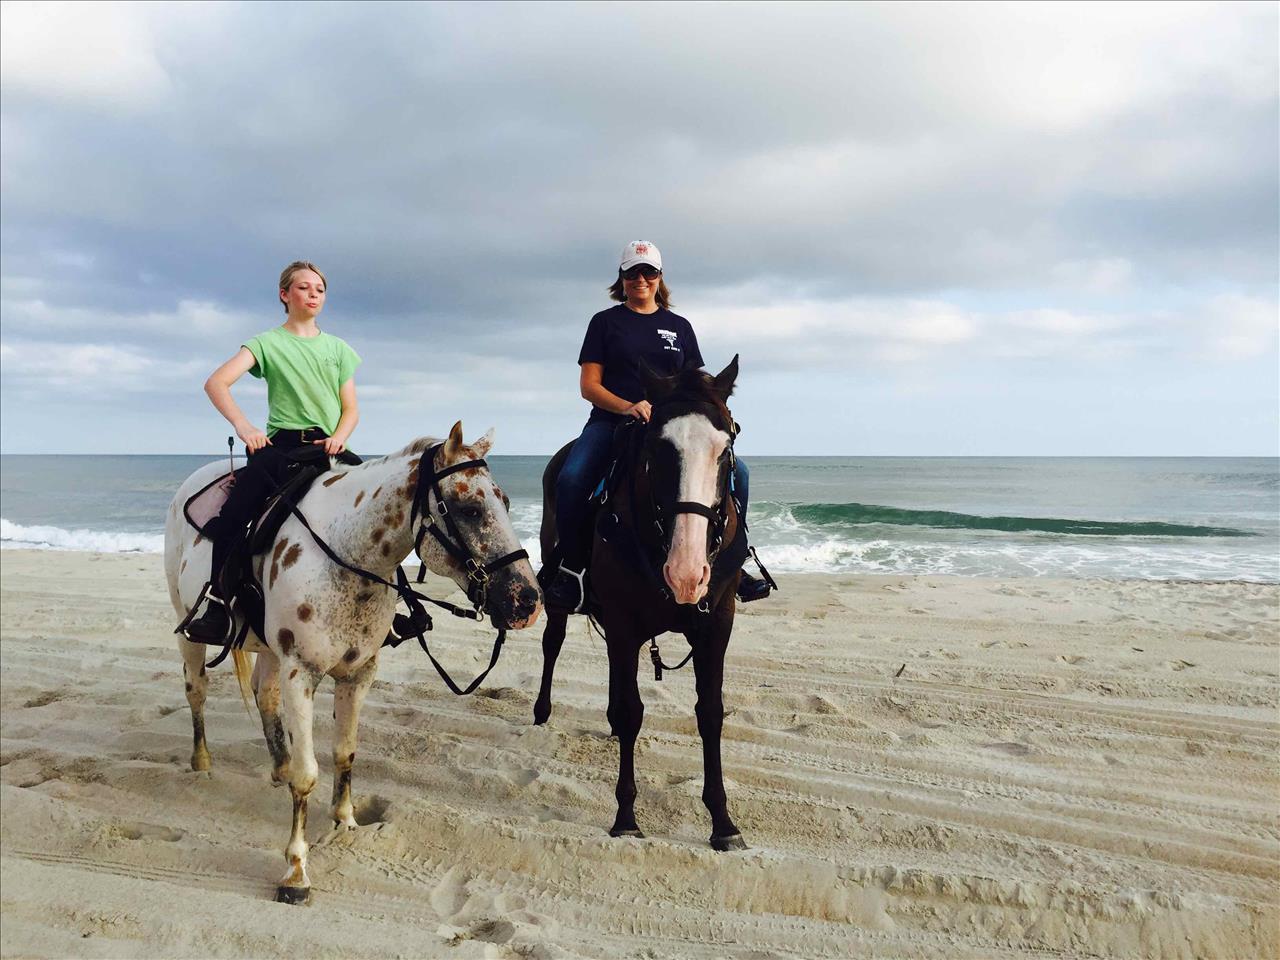 August 2015 Stay - VP204 - Seascape Escape, Lisa Ness